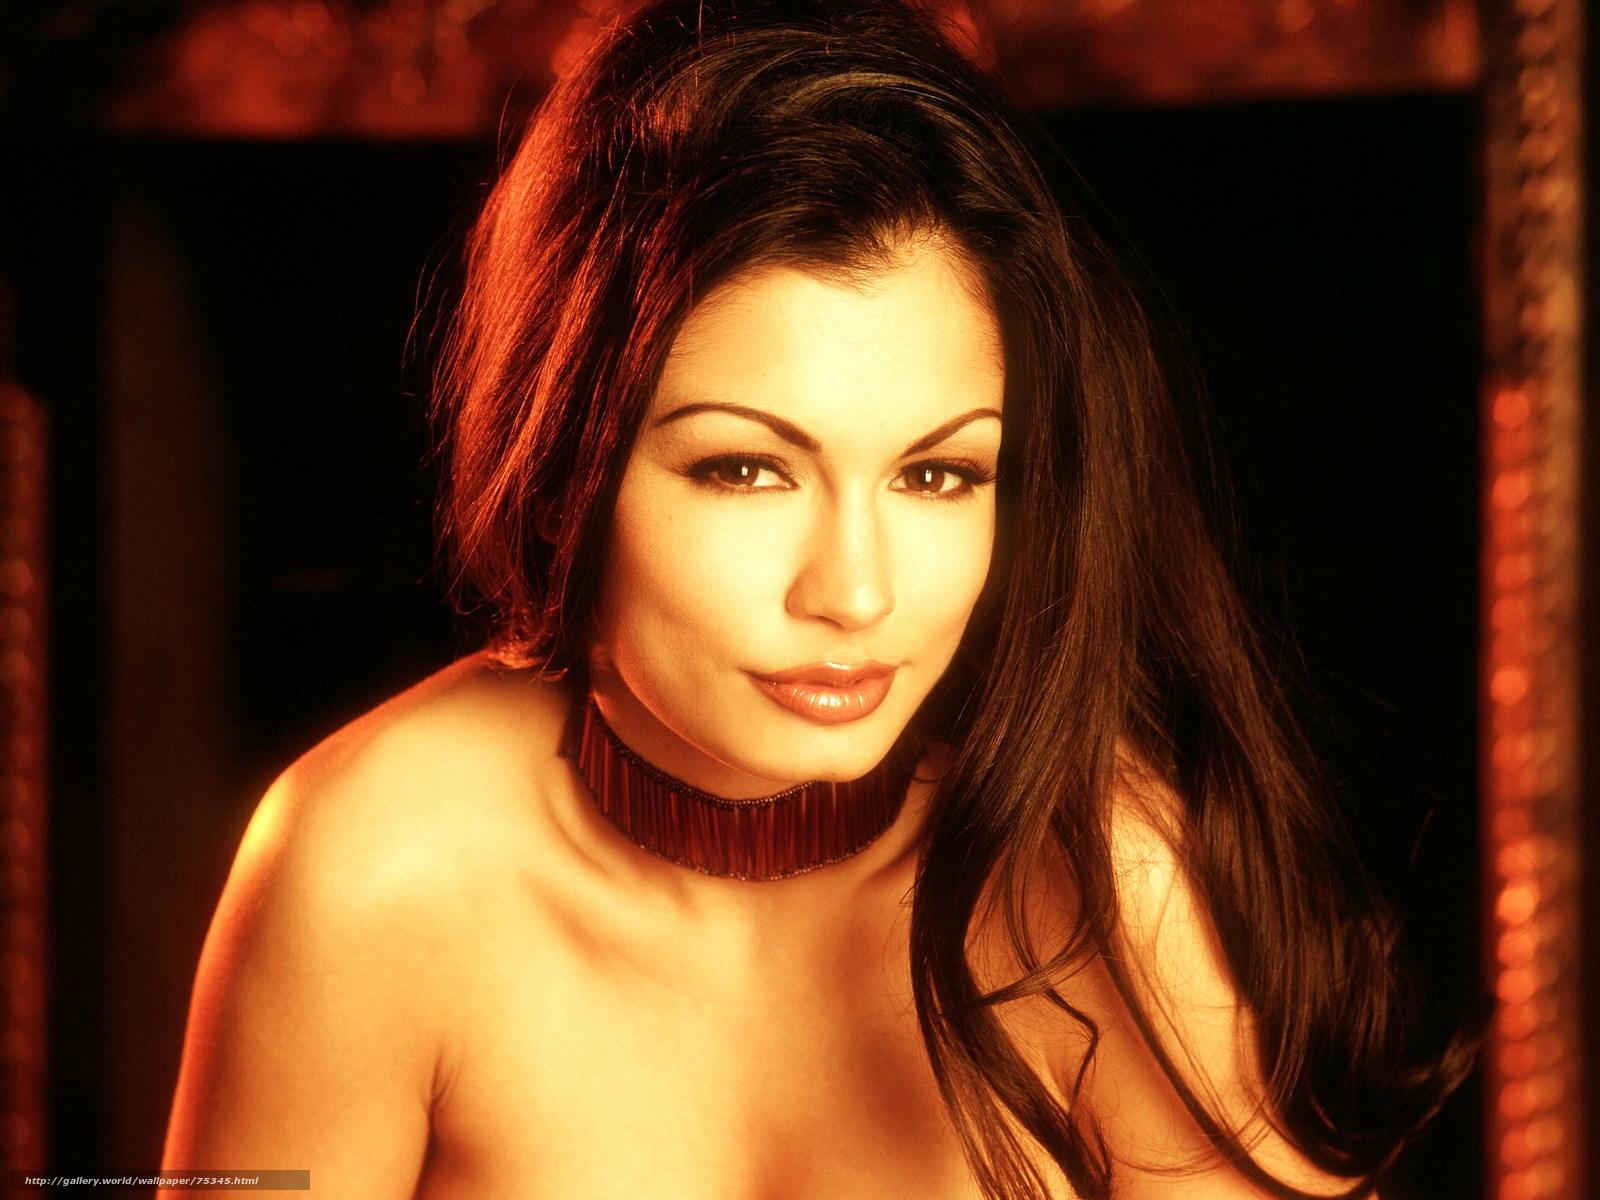 Фото ариа джовани, Aria Giovanni - все порно и секс фото модели 9 фотография